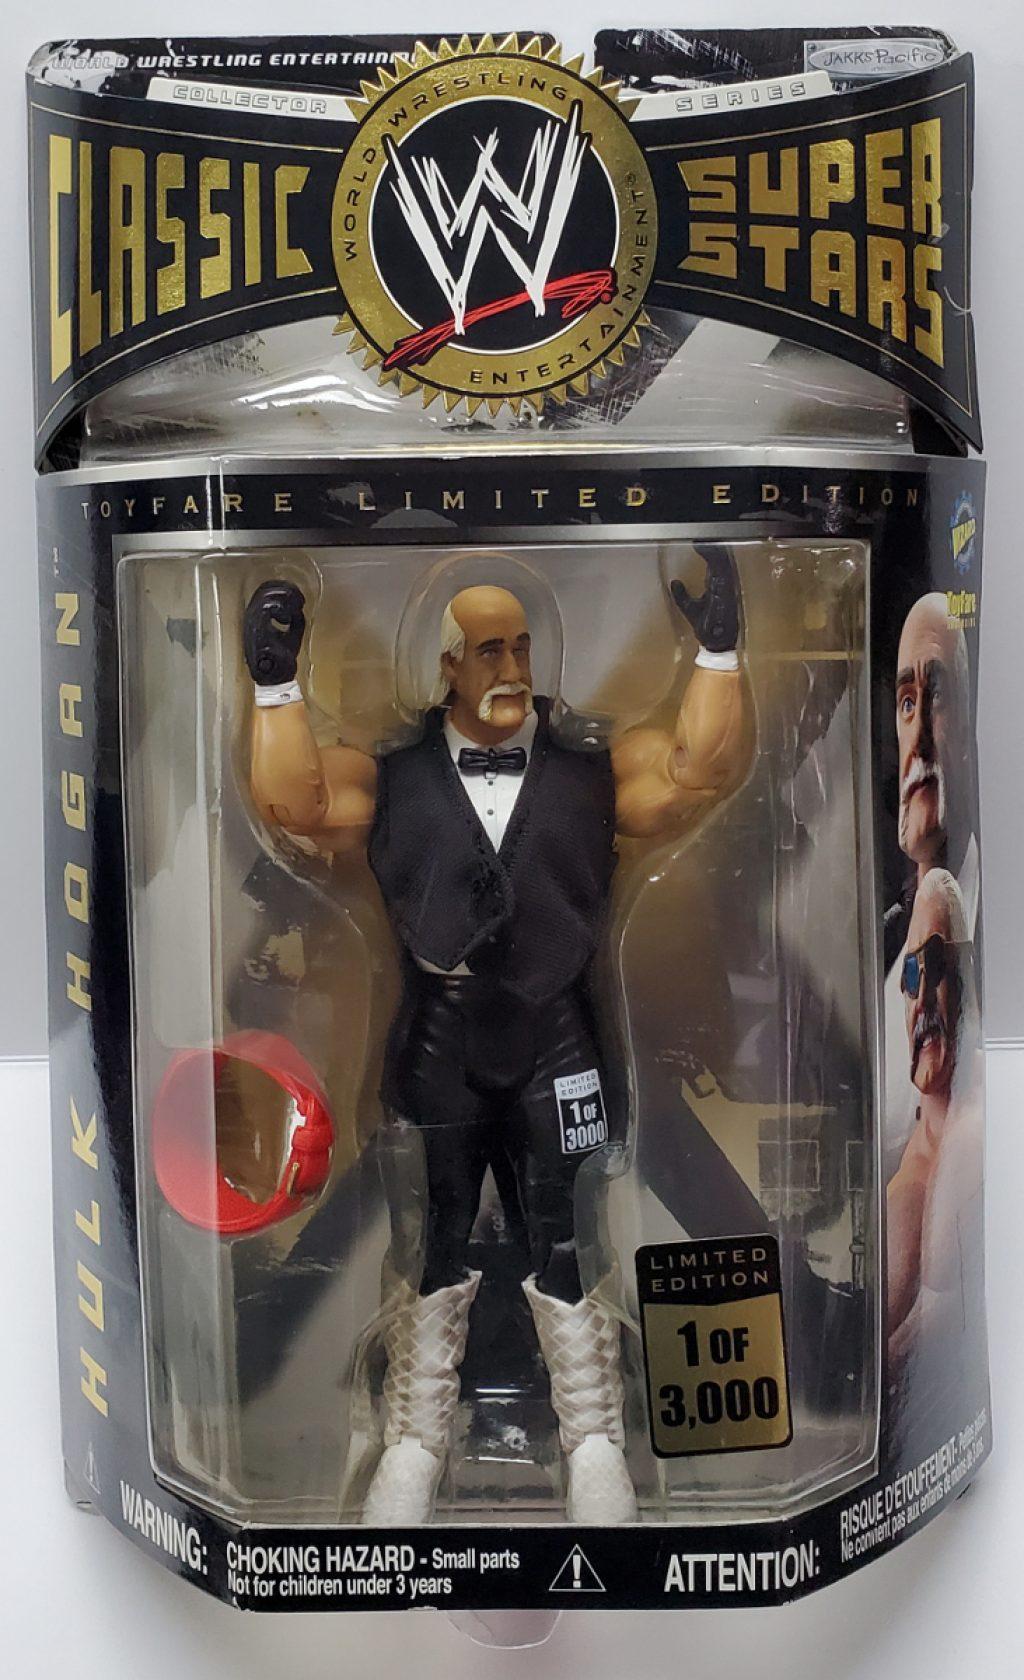 WWE Classic Super Stars Toyfare Limited Edition Hulk Hogan Action Figure 1